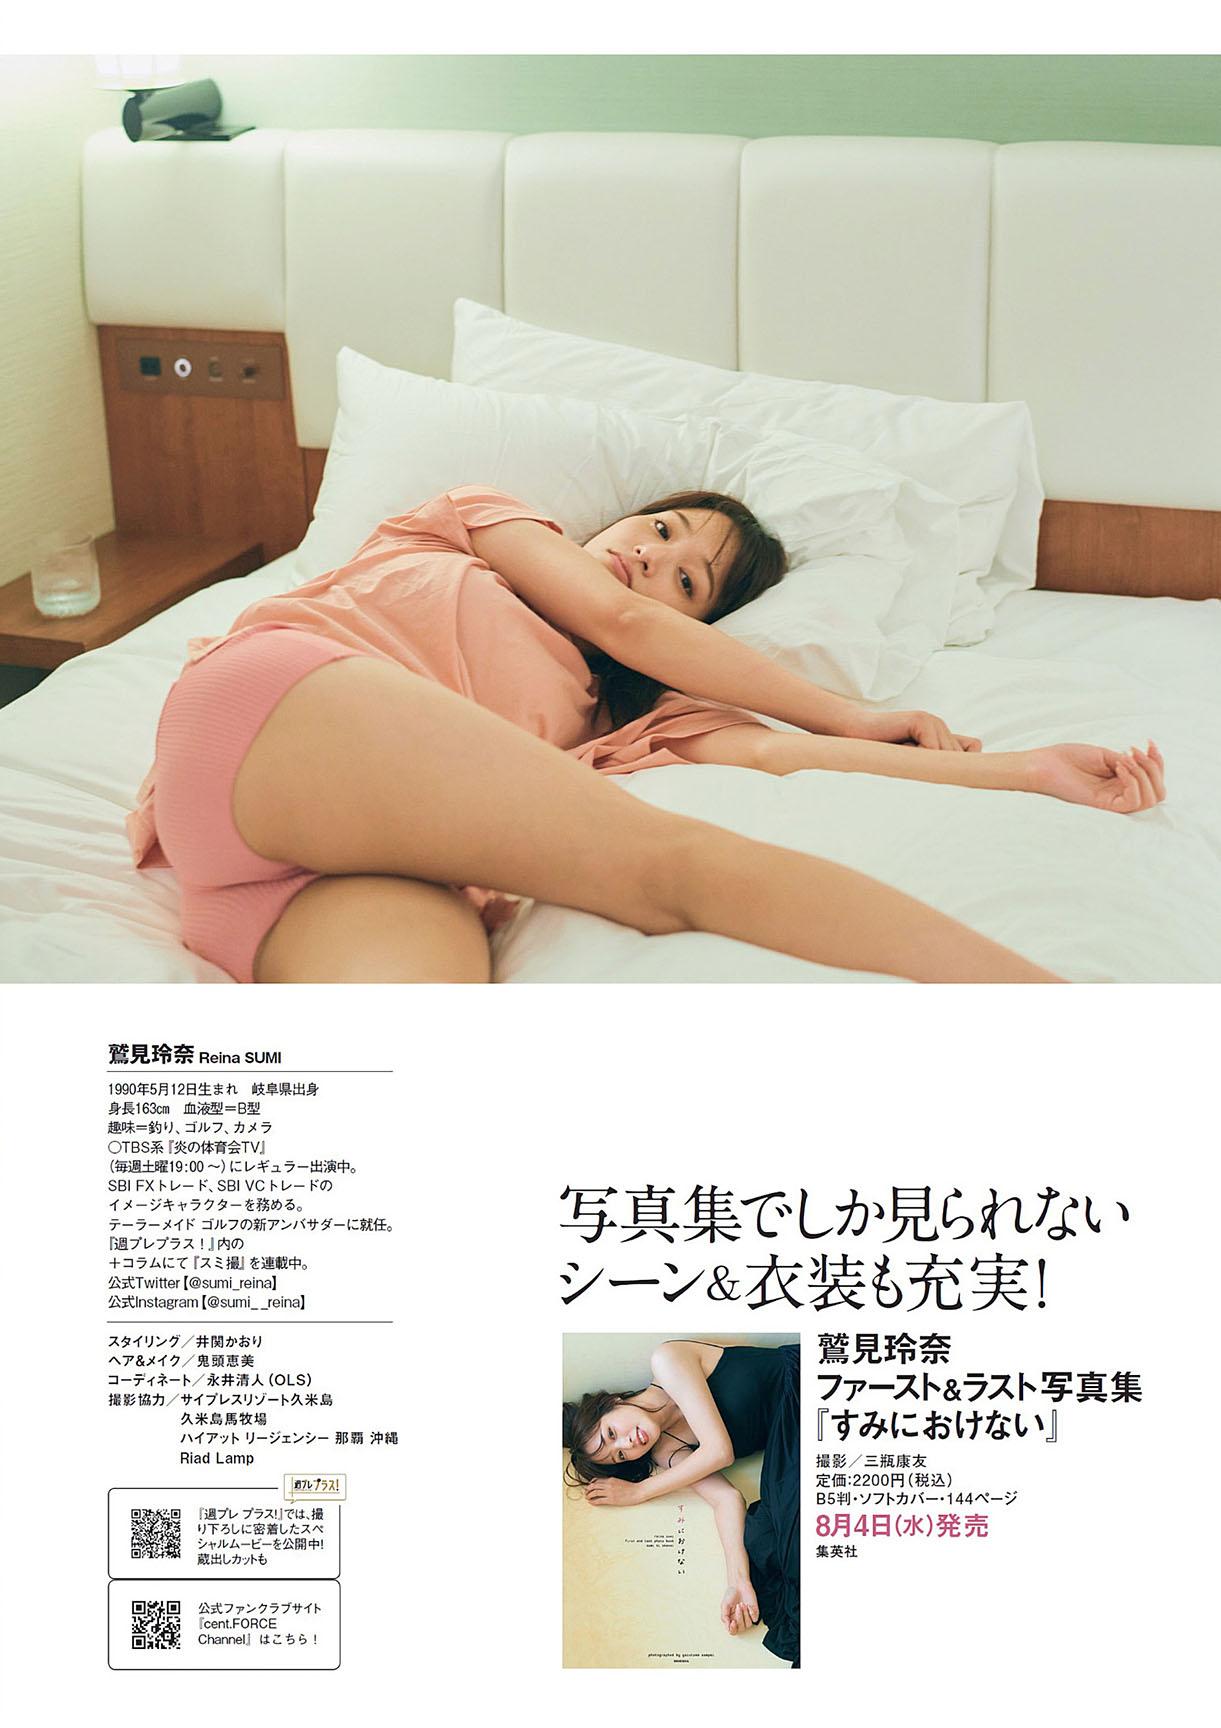 Reina Sumi WPB 210823 11.jpg